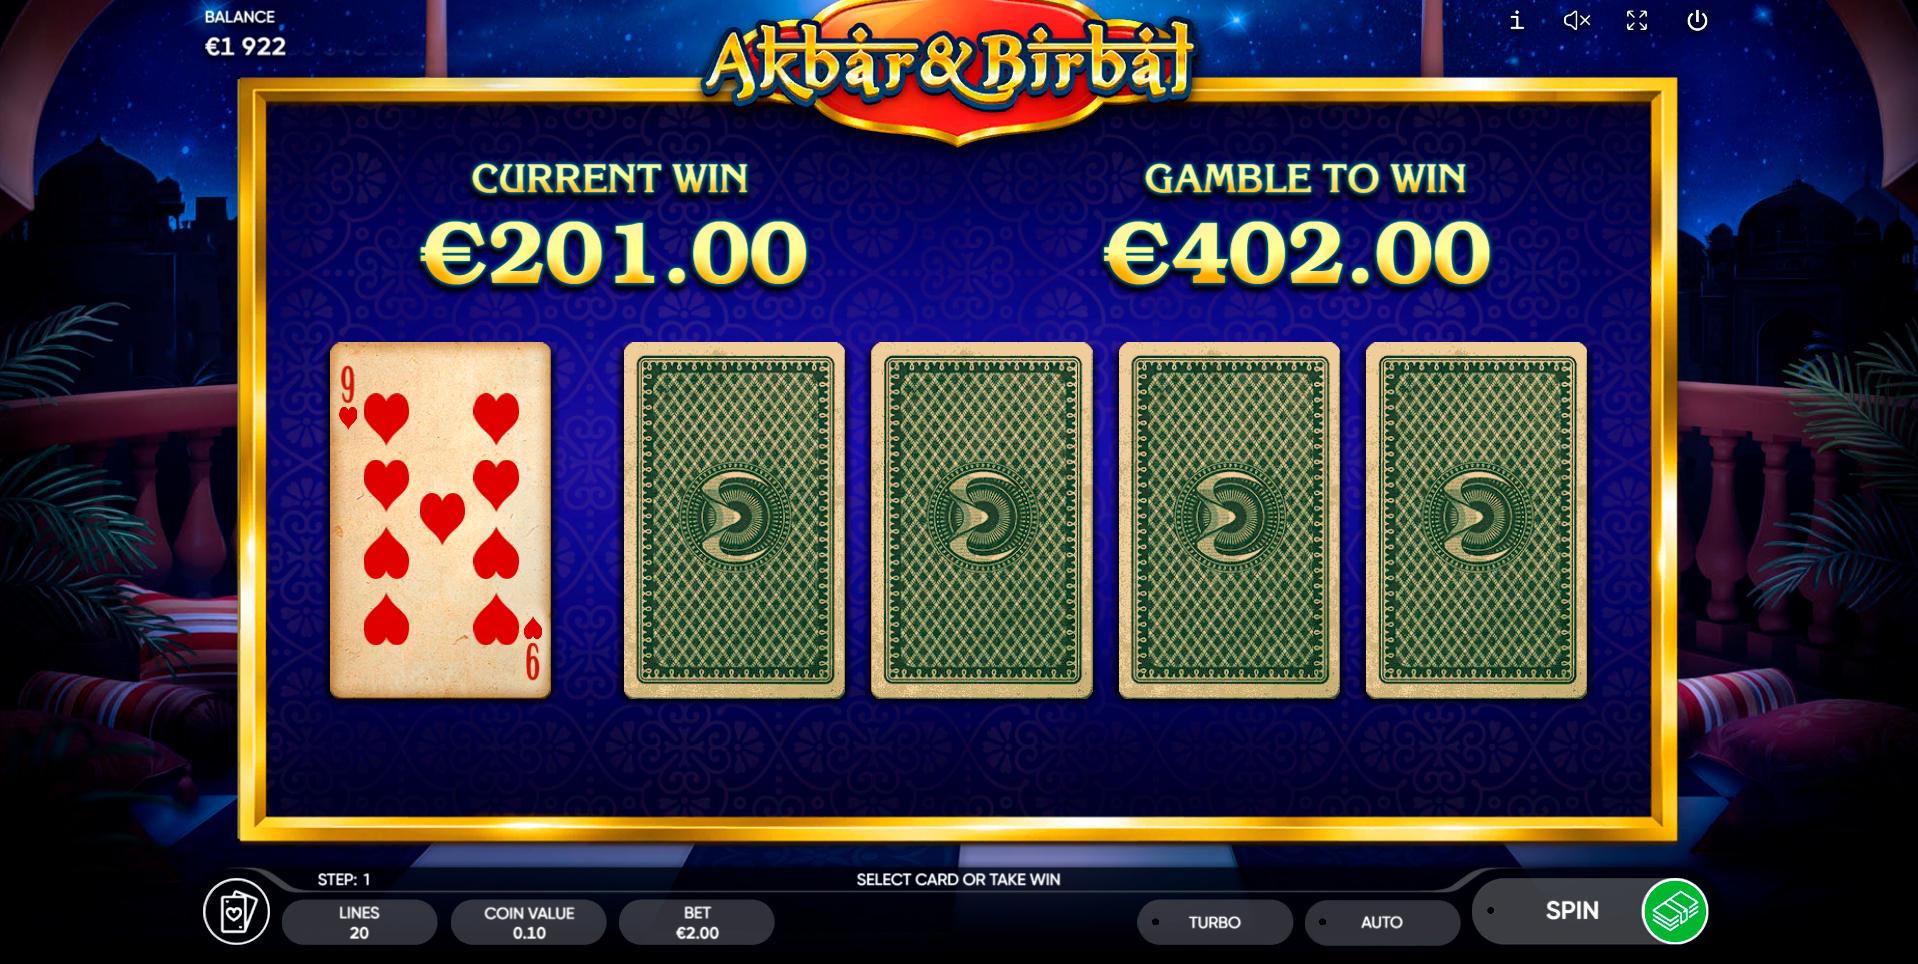 Akbar & Birbal - Risk Game screenshot